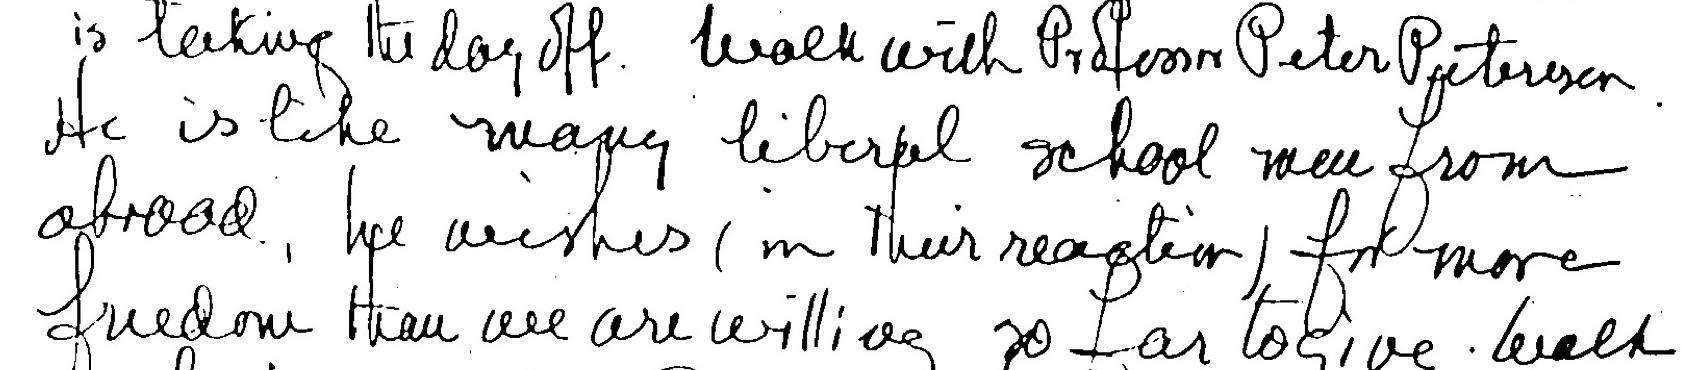 Figure 3: Peter Petersen, in Kilpatrick's, diary (vol. 24), April 12, 1928 (Source: GL-TCCU [GotLib])